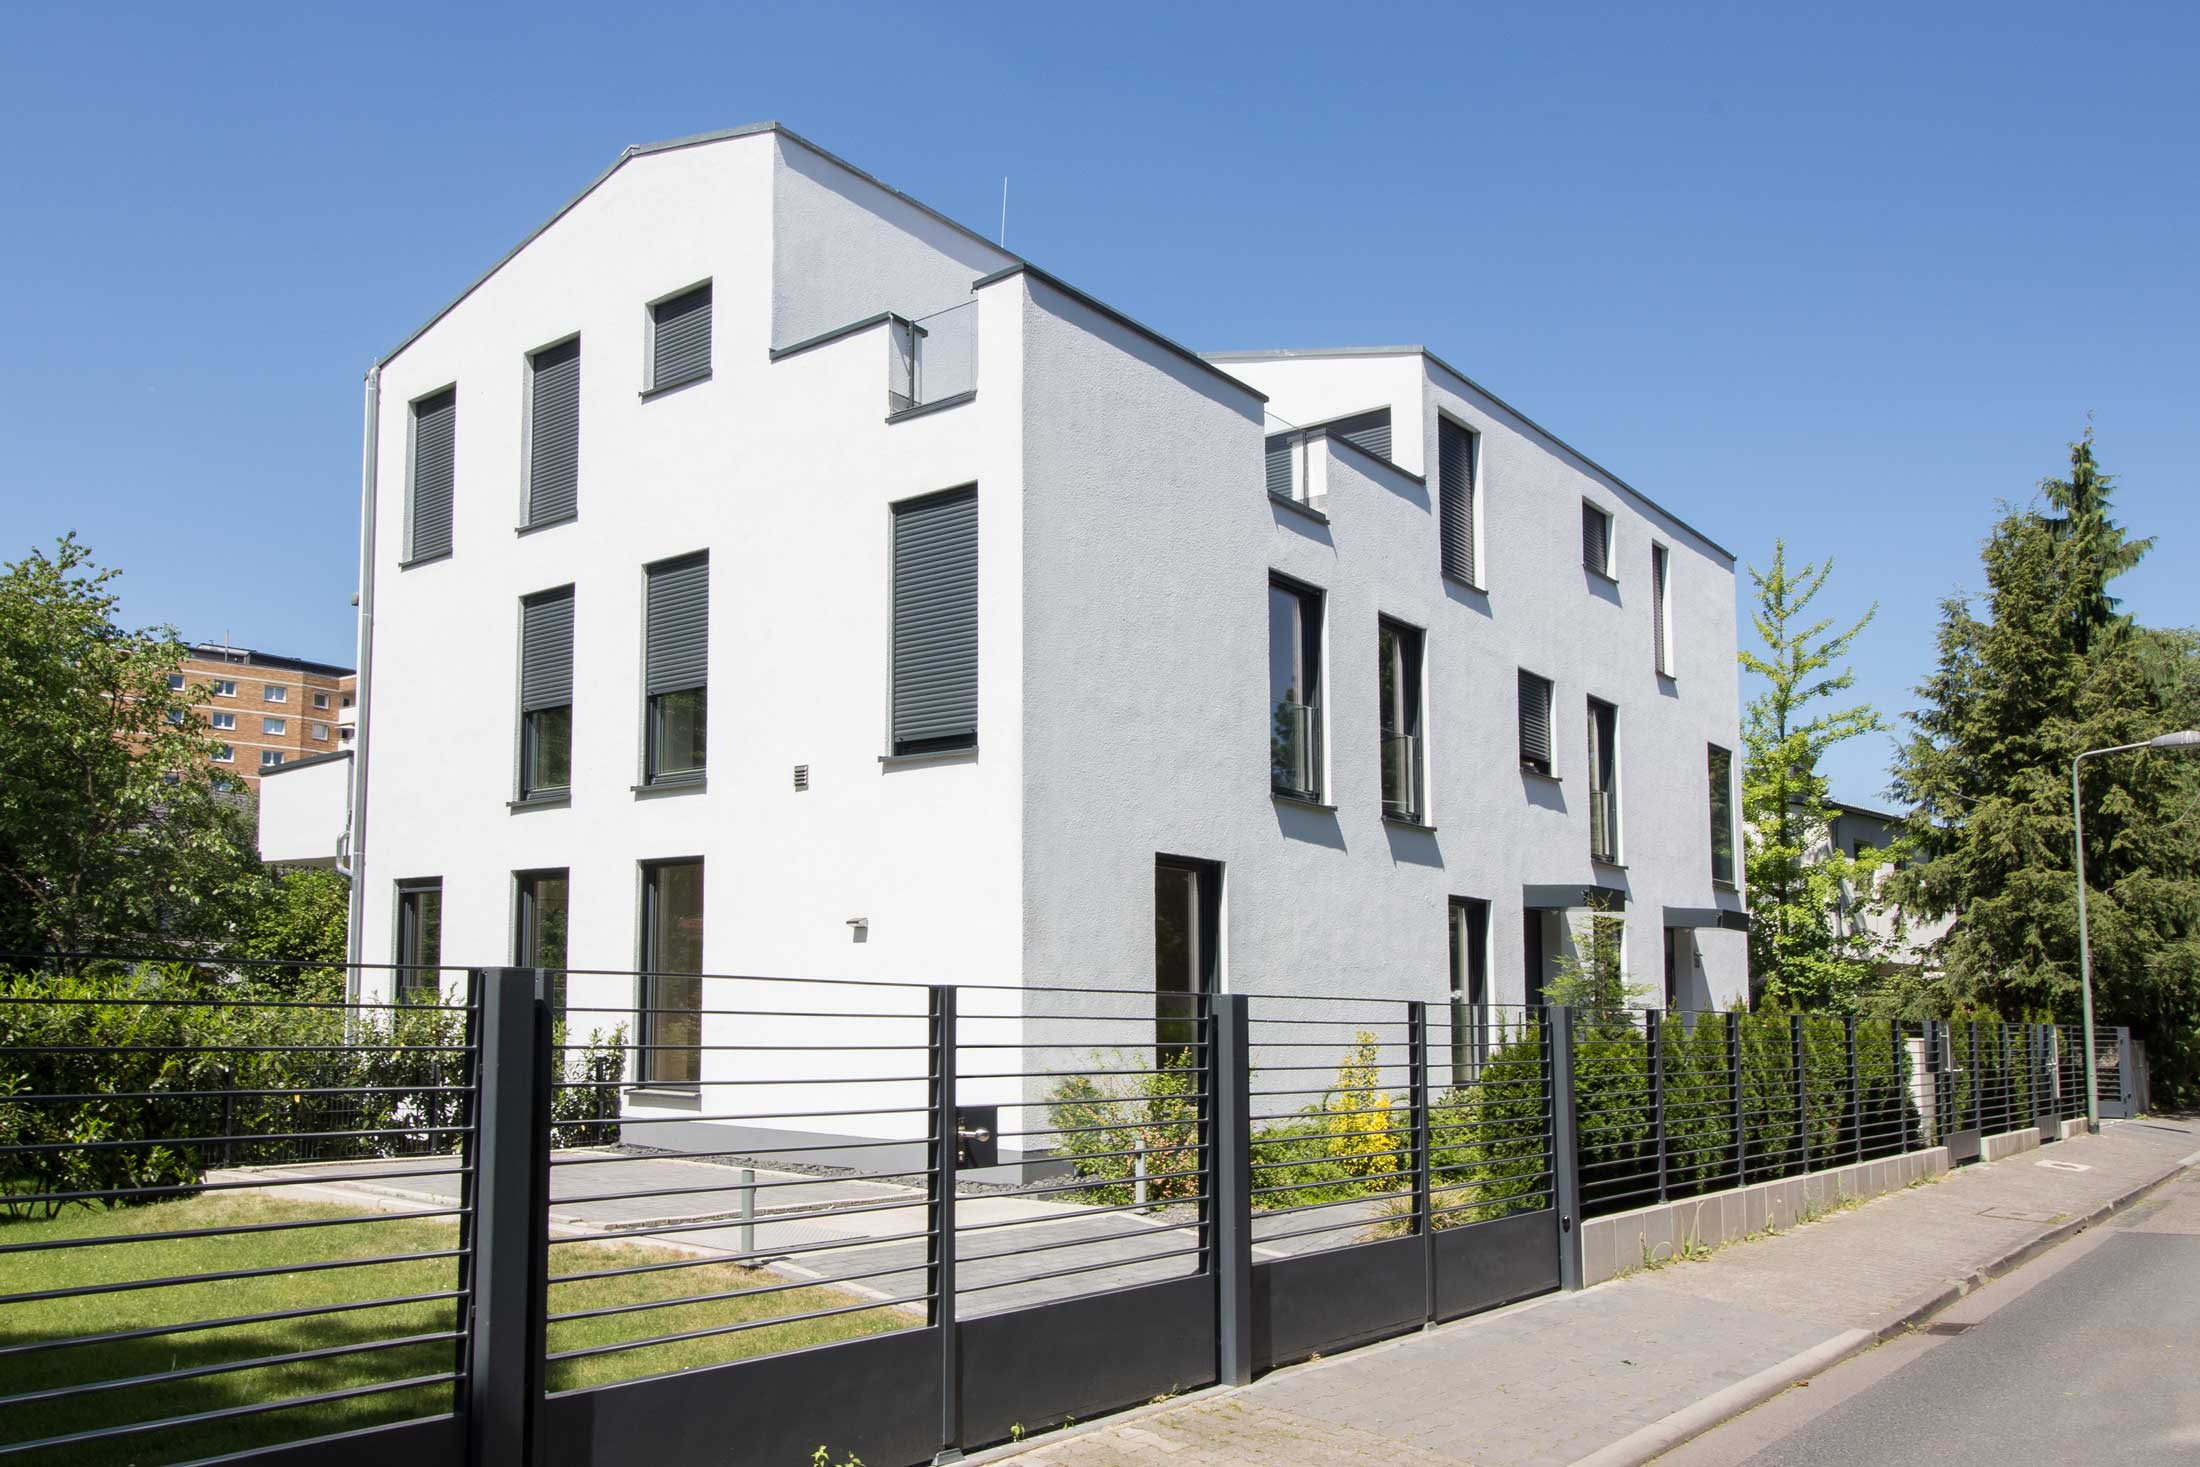 Biek architektur architekt aus frankfurt am main - Fh frankfurt architektur ...